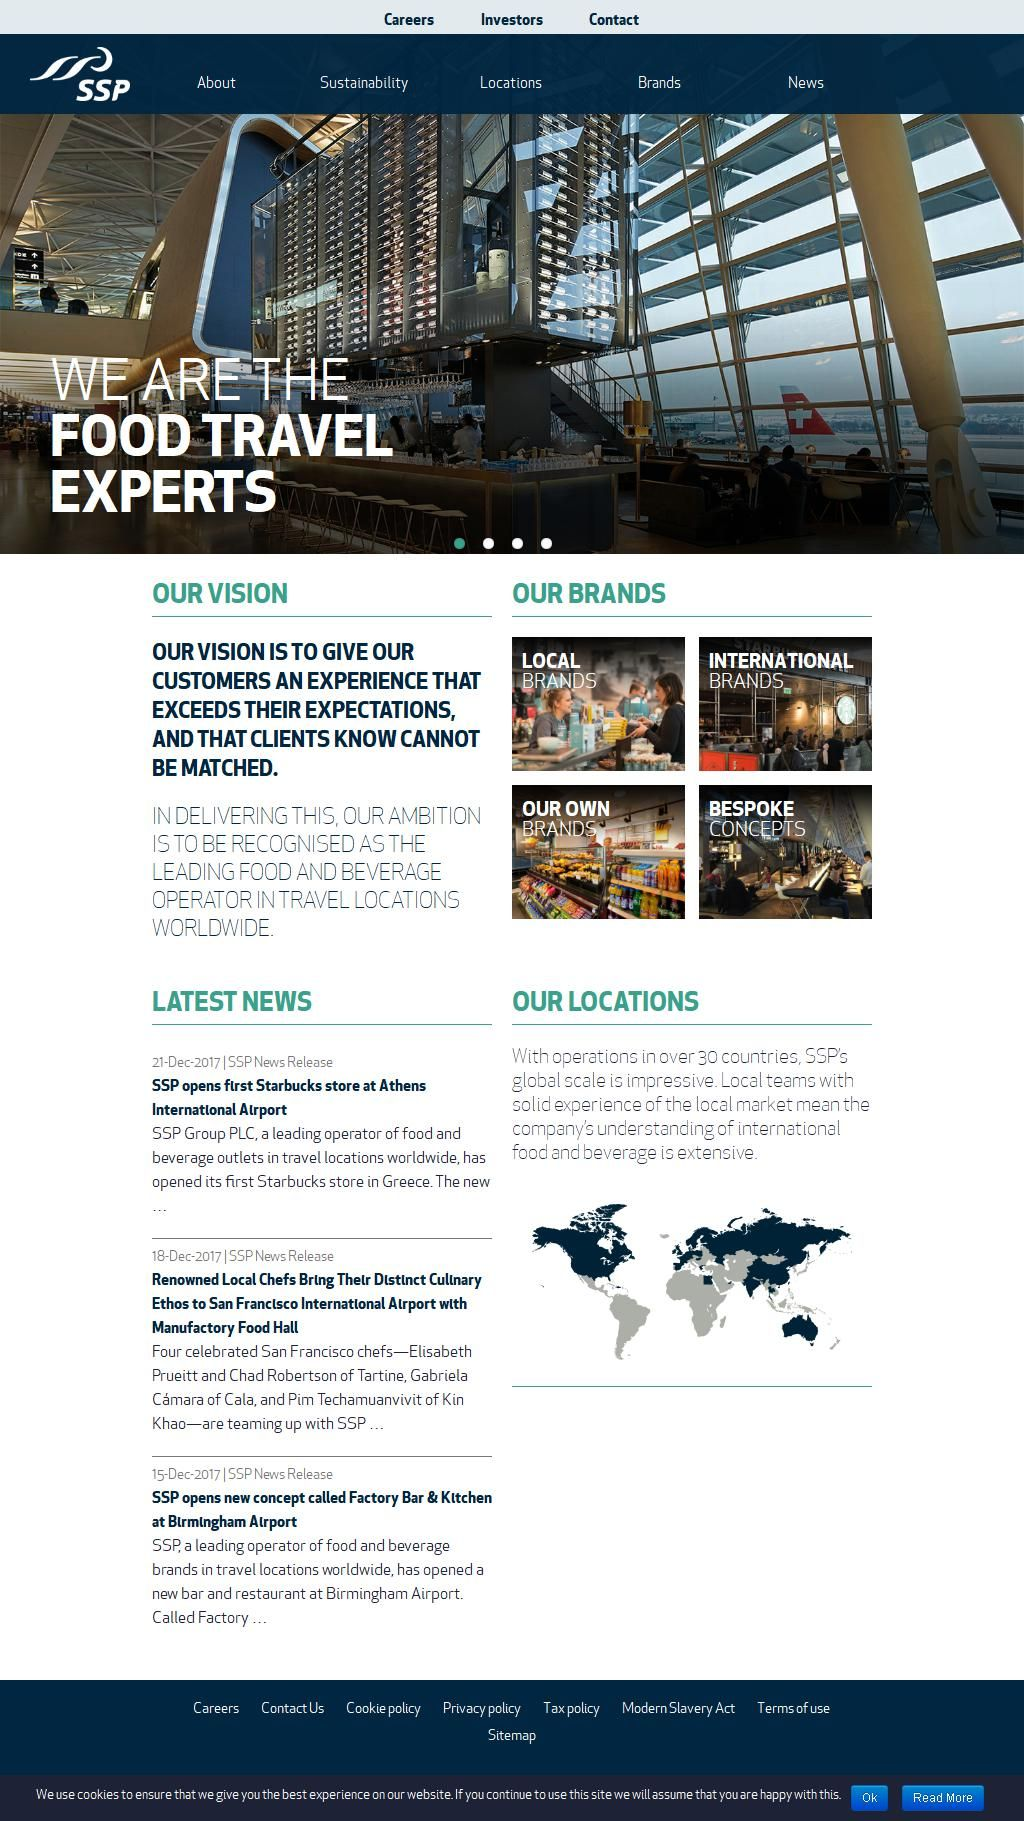 Ssp Uae The Food Travel Experts Company Al Nisf Building 7